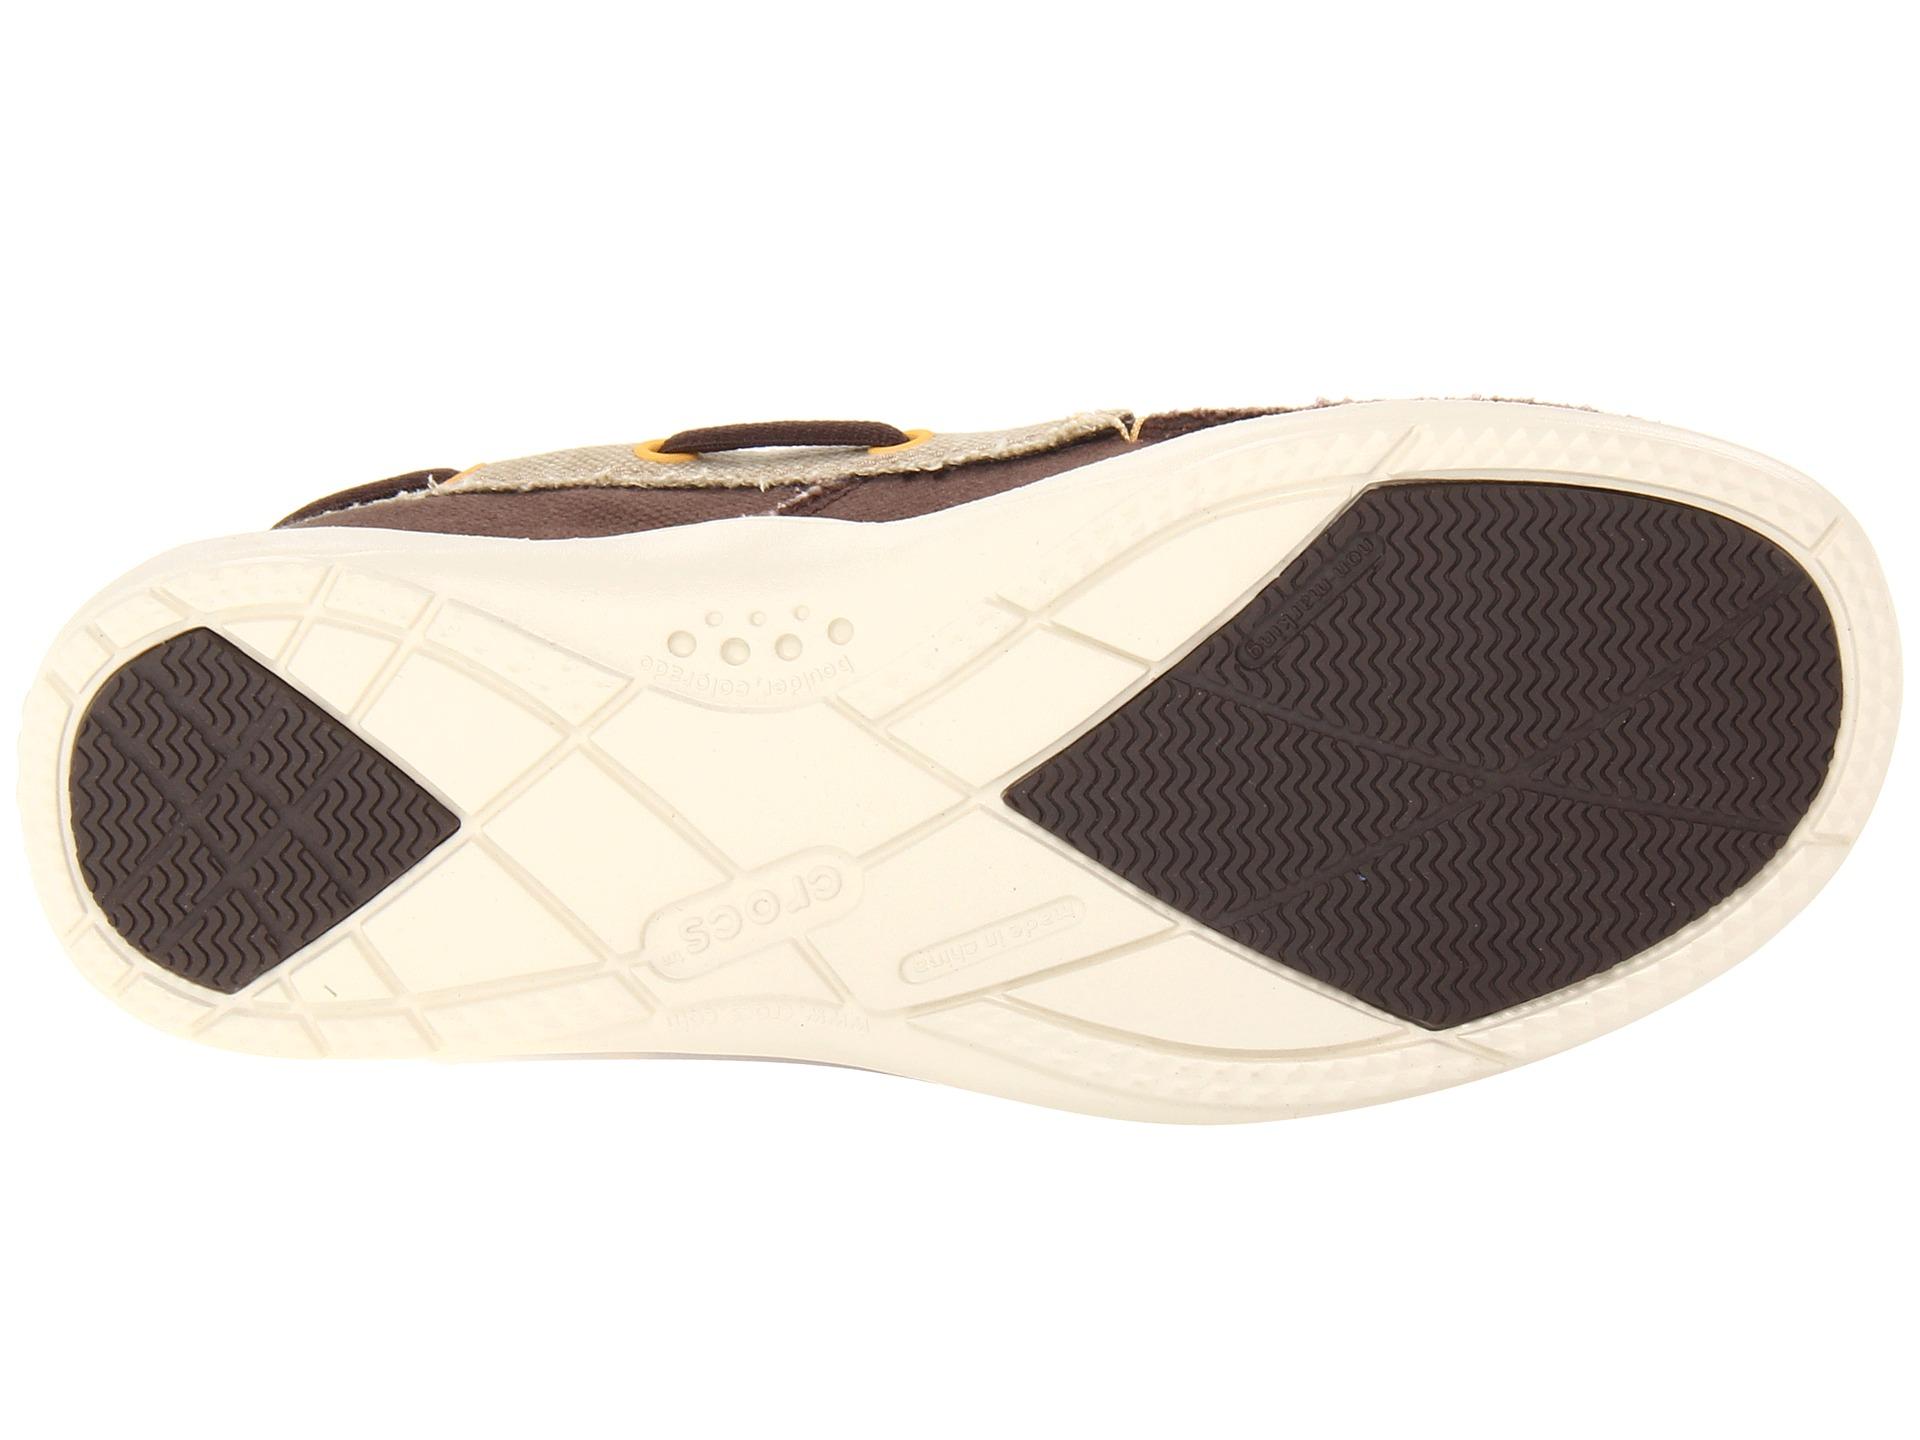 7a47922c4d1 Crocs Walu Canvas Deck Shoe